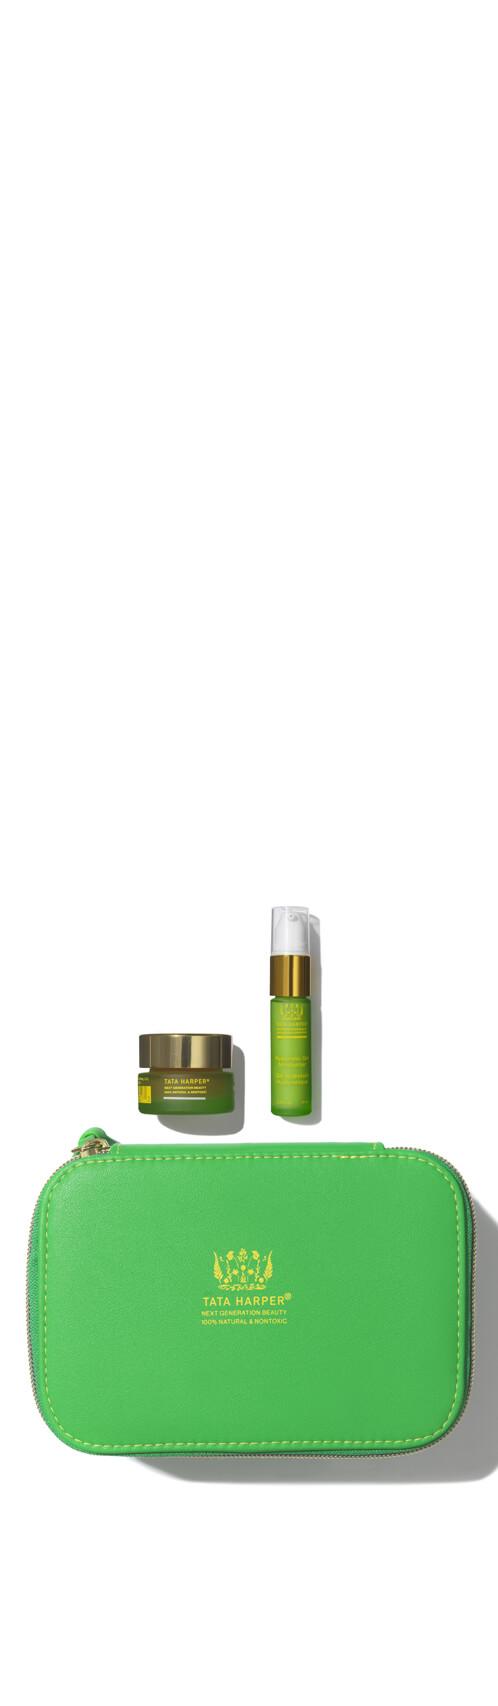 Tata Harper Deluxe Skincare Duo